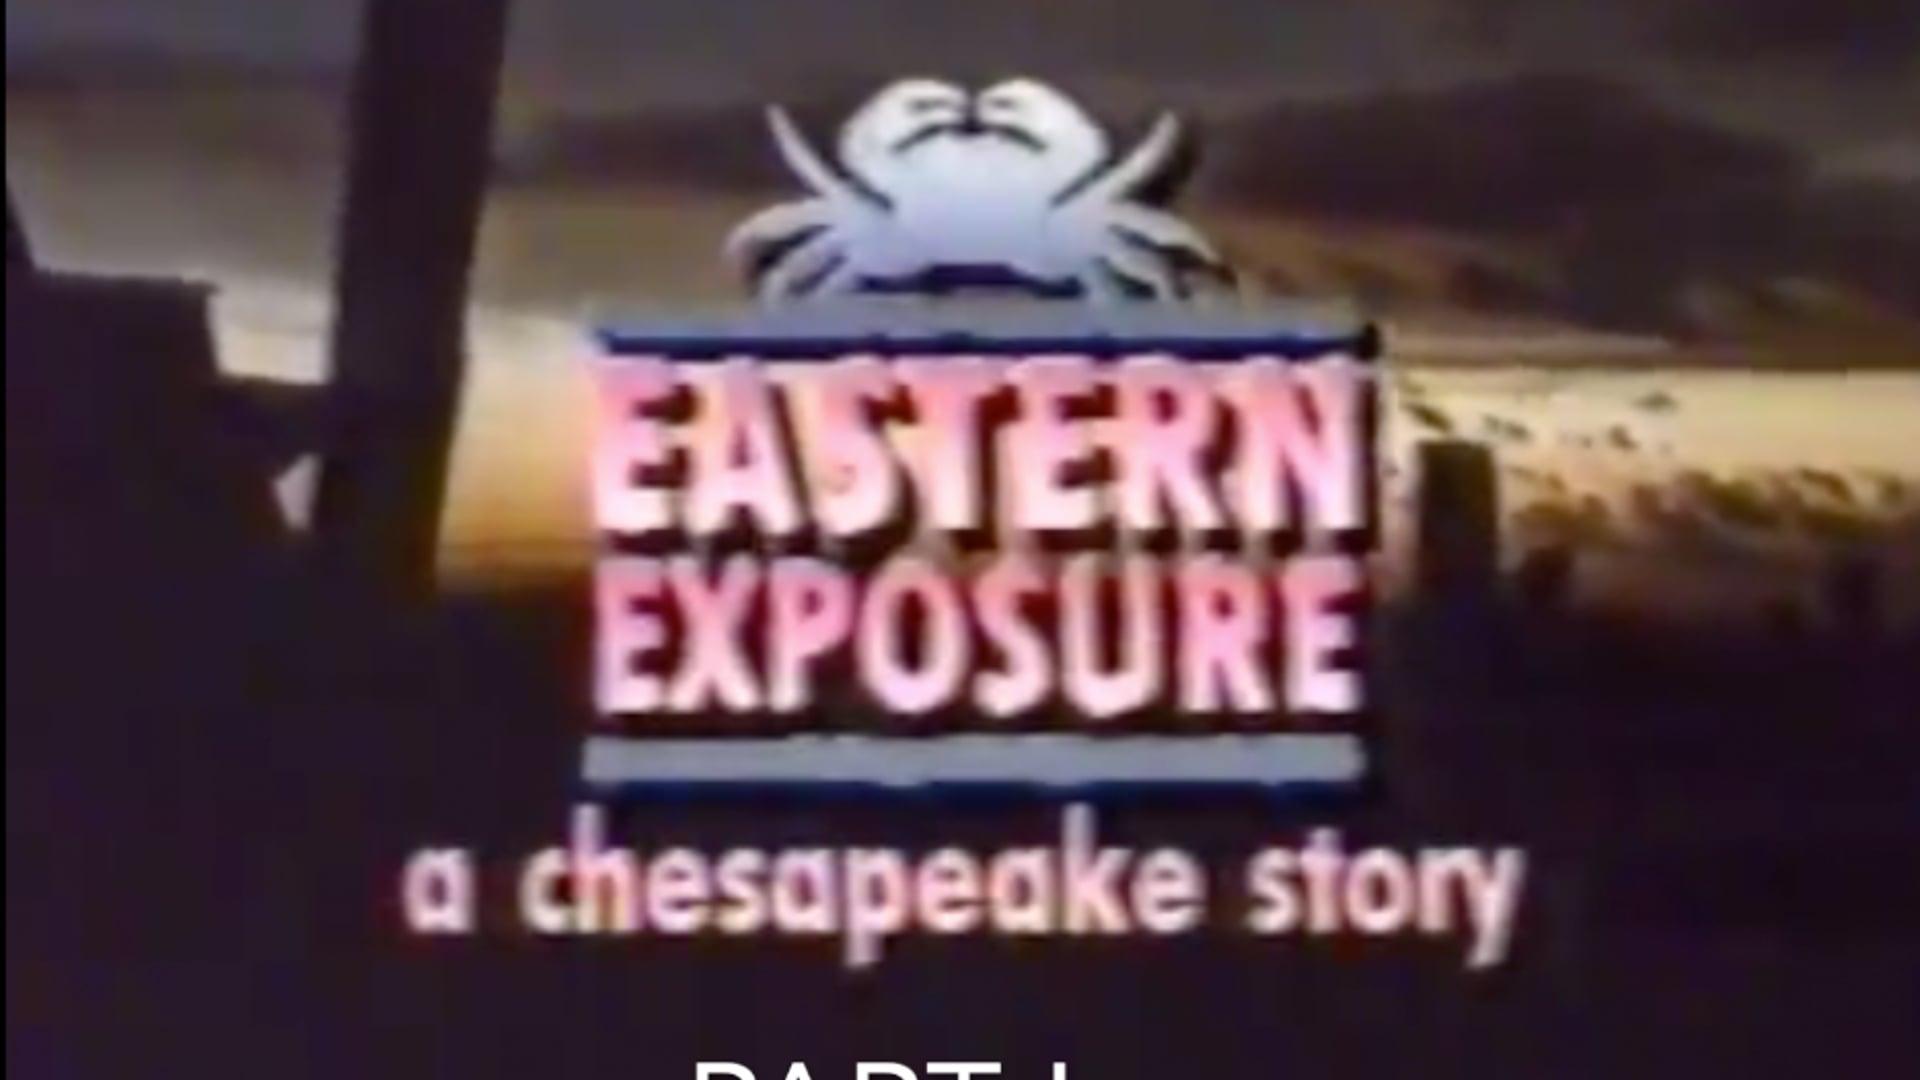 Eastern Exposure Part I of IV